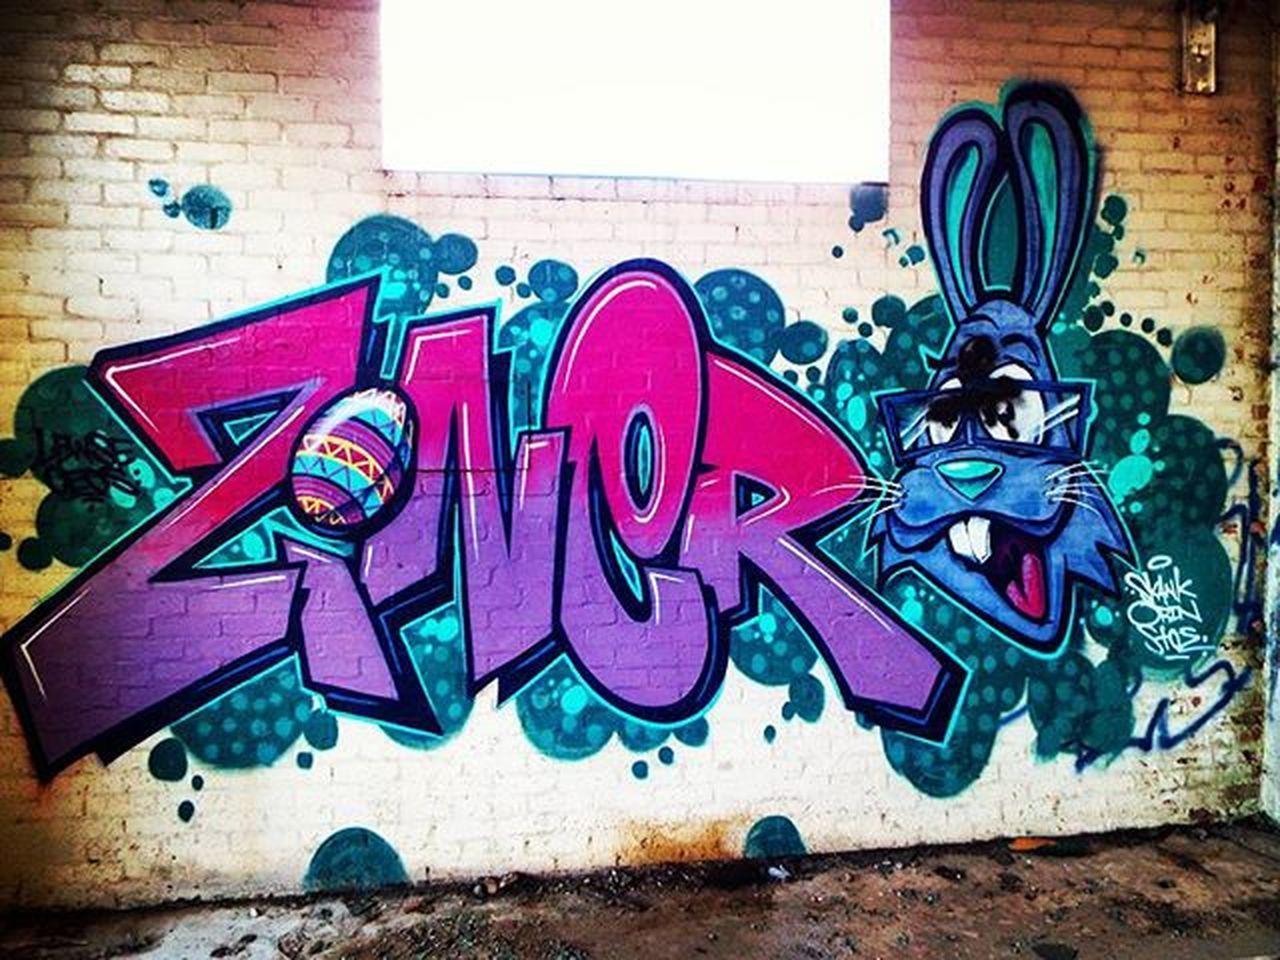 Graffitiporn Graffiti Urbanexplorer Urbanexploration Abandoned Abandonedbuilding Abandoned_junkies Abandonment_issues Abandonment Urbex_rebels Urbex Ww1 Ww2 Militarybuilding Military Streetart